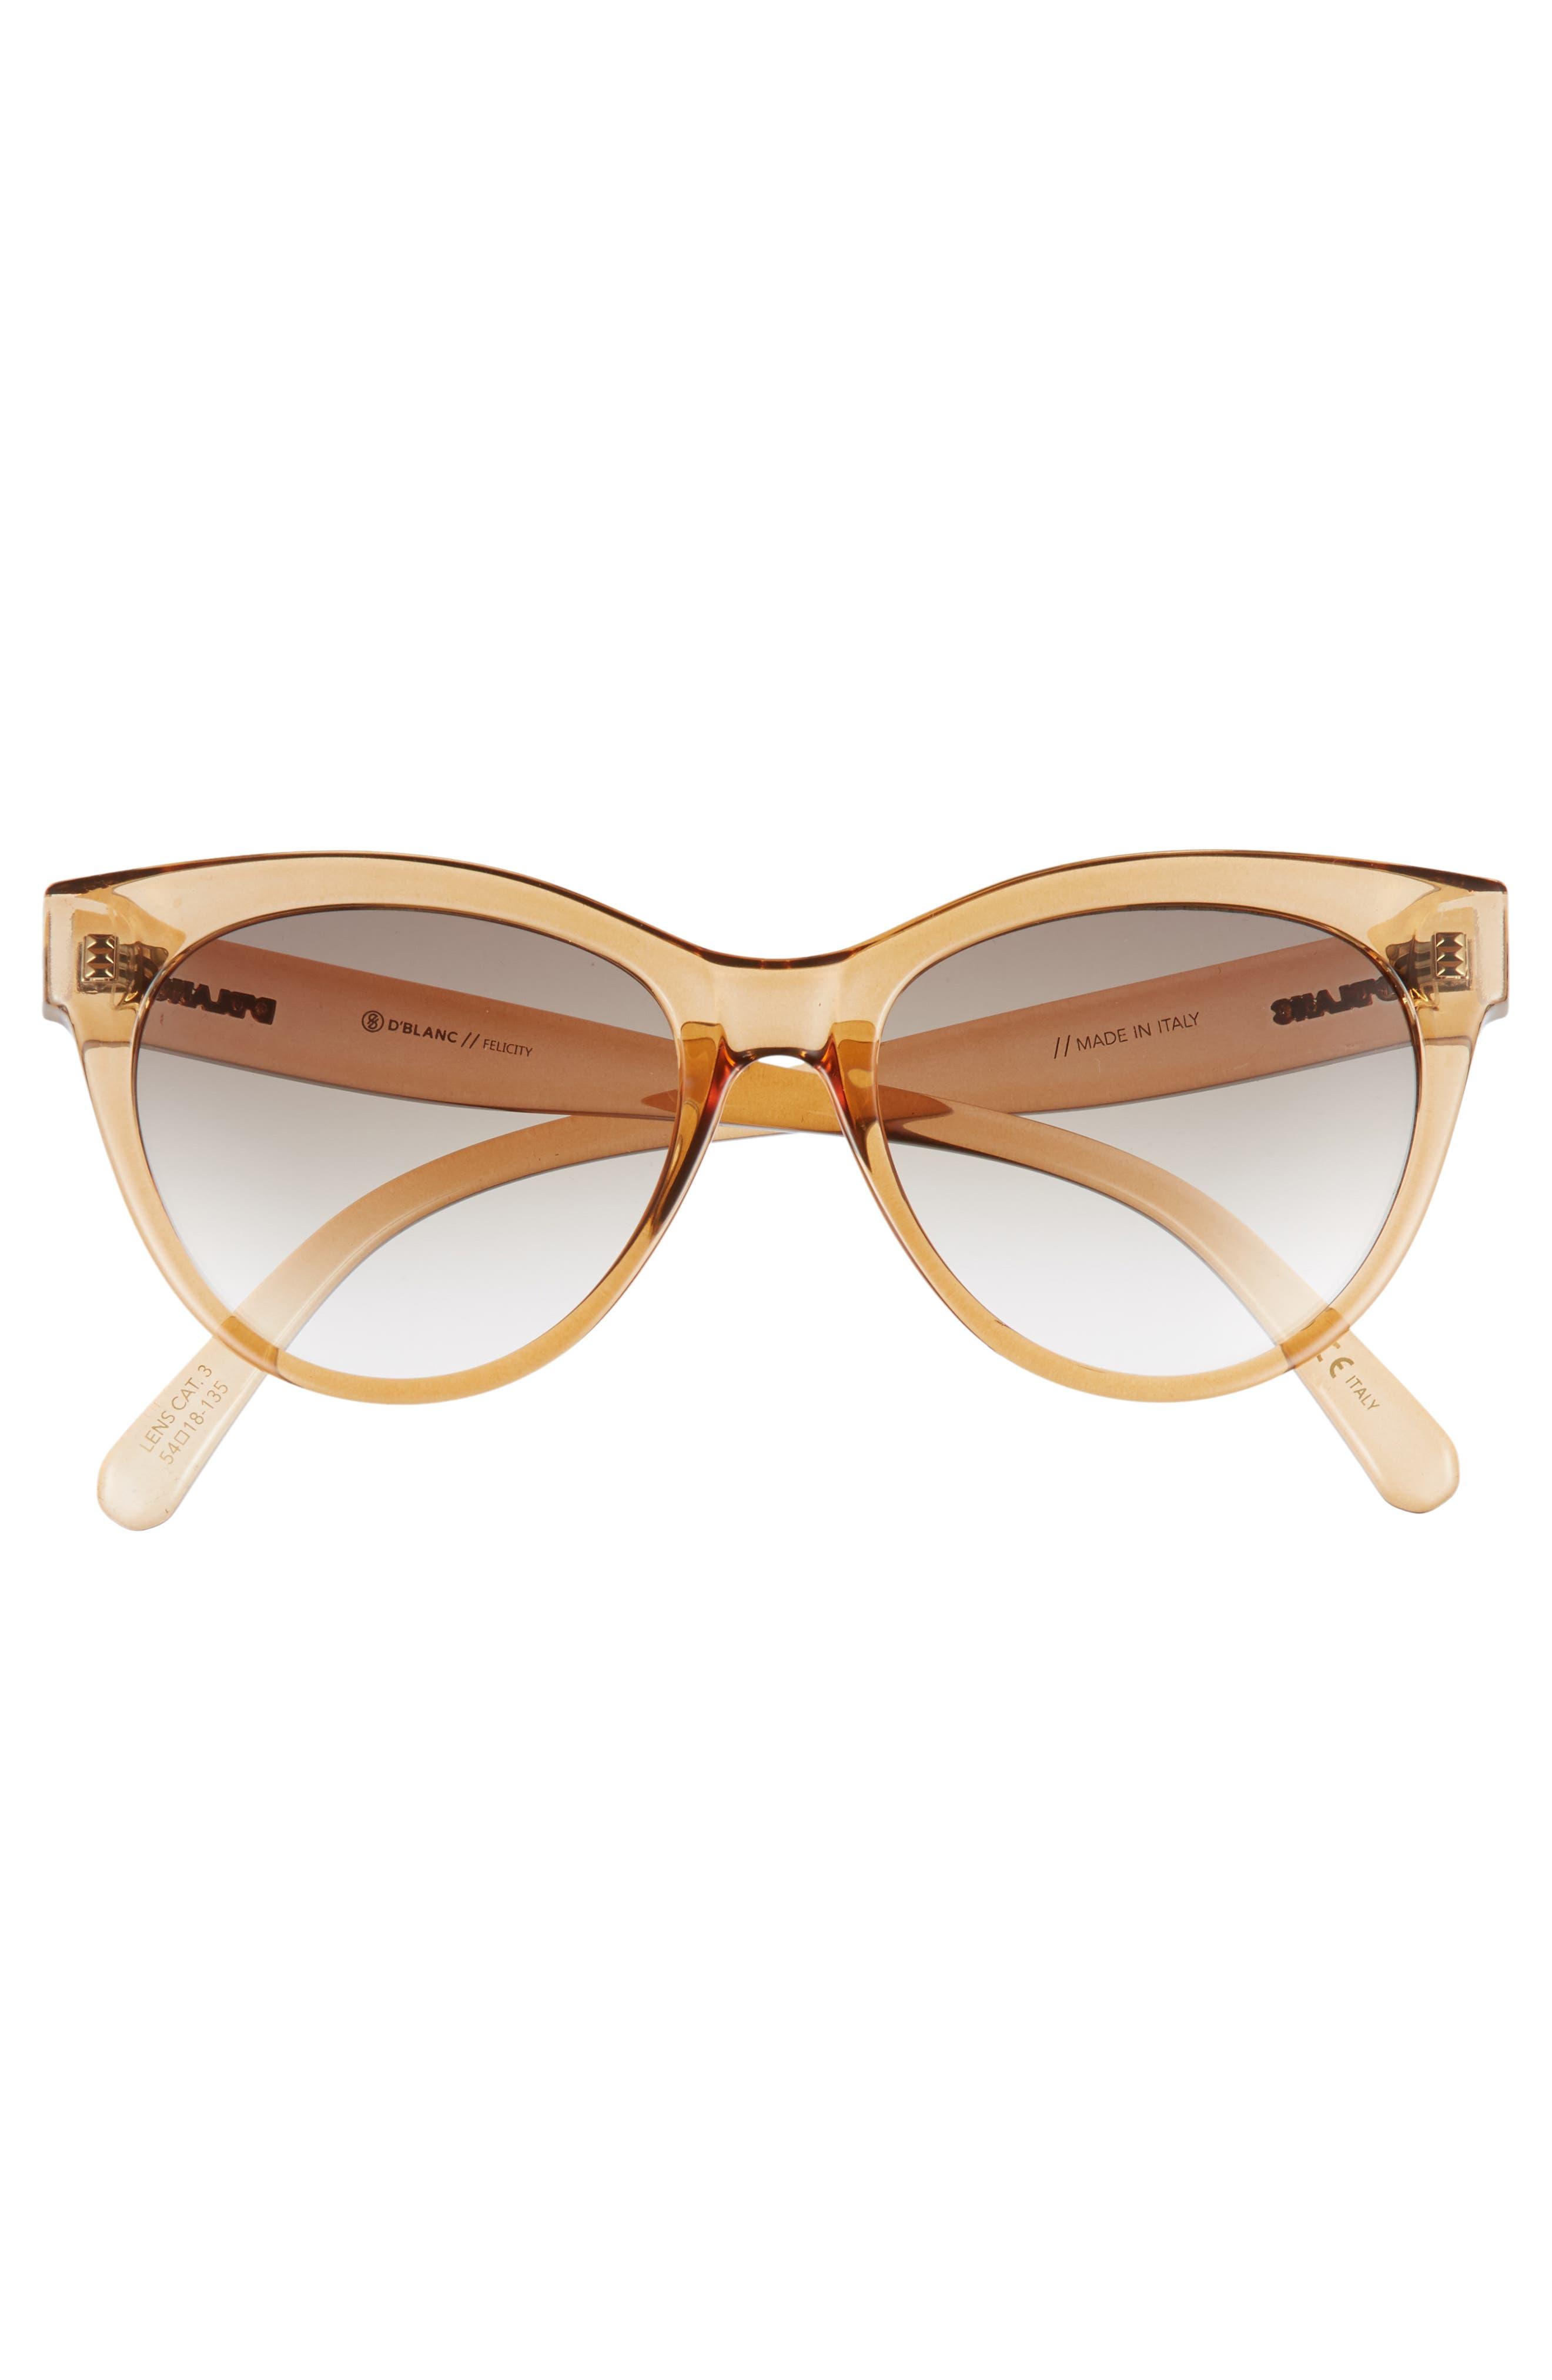 D'BLANC Felicity 54mm Cat Eye Sunglasses,                             Alternate thumbnail 3, color,                             Chai Gloss